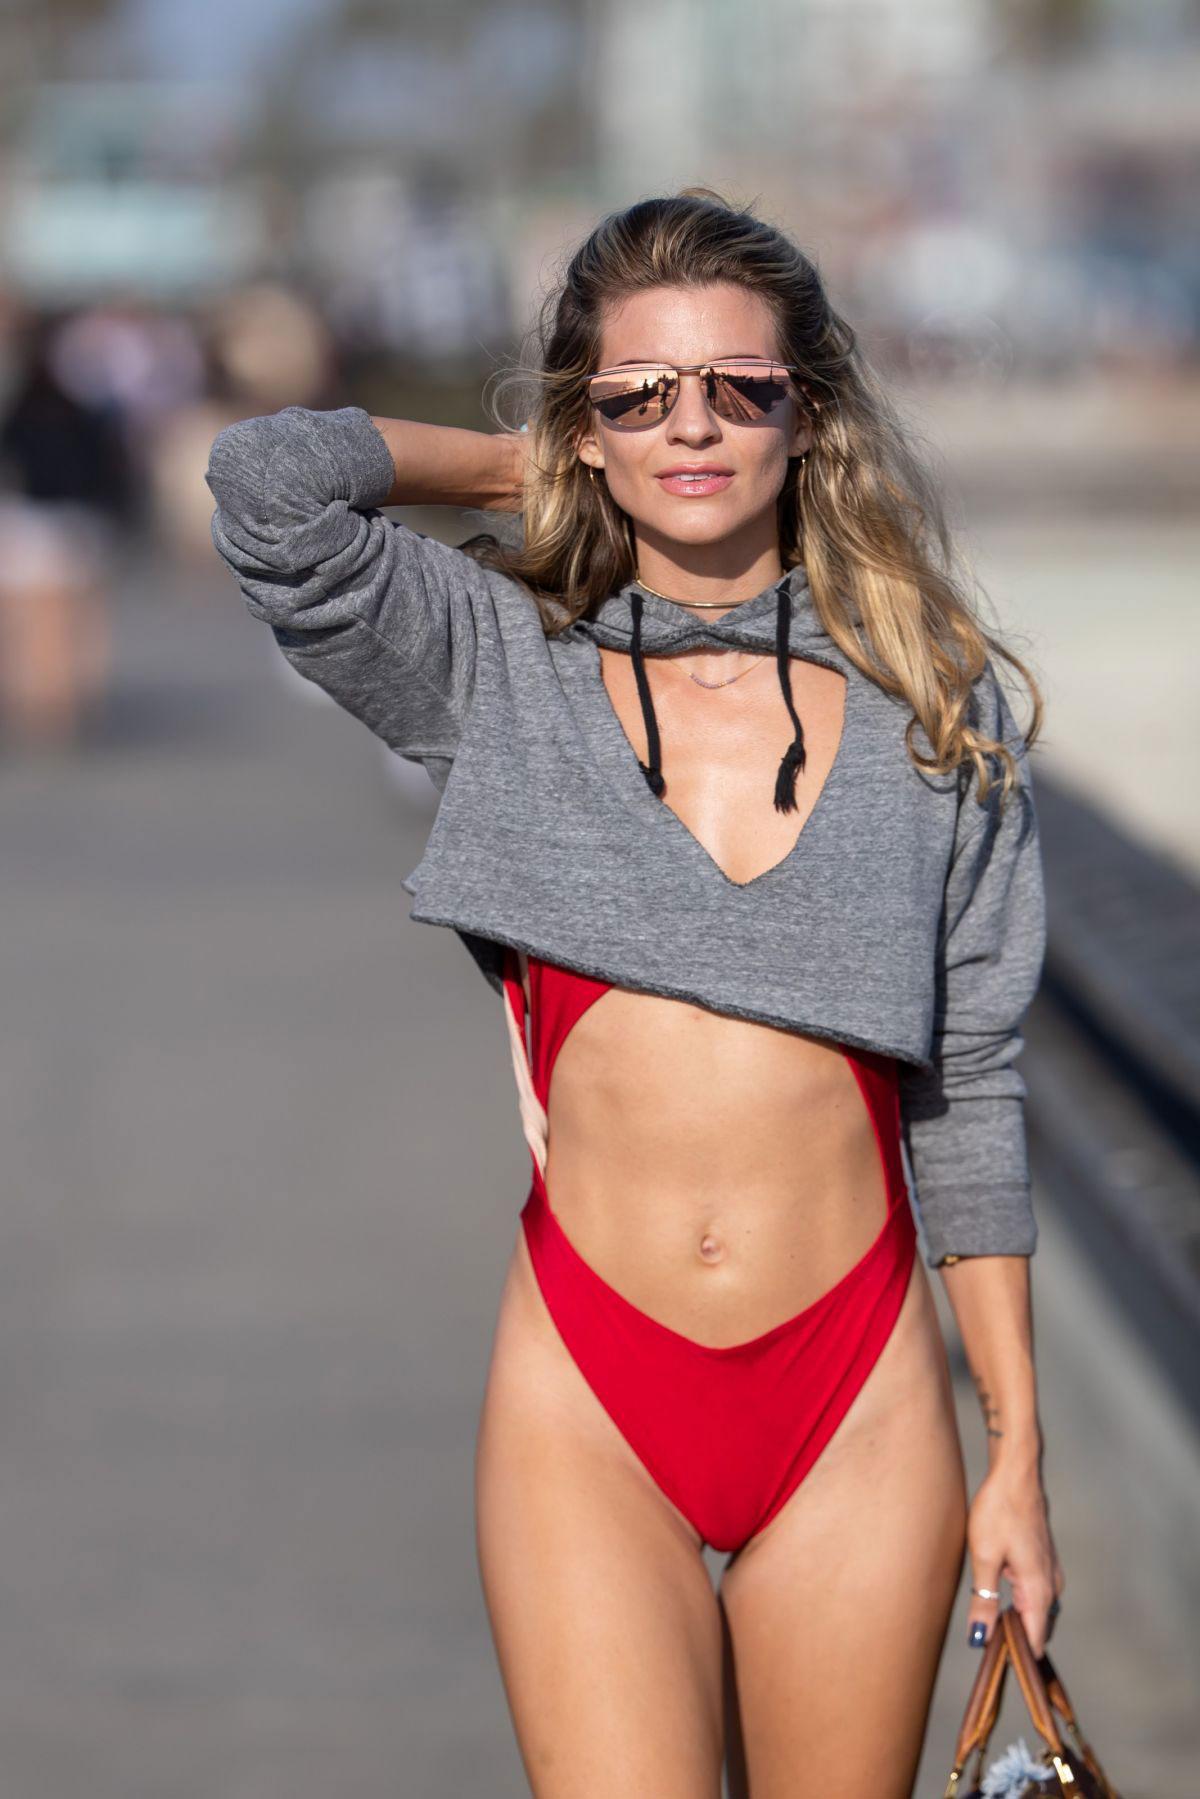 Celebrity Rachel McCord nudes (55 photo), Pussy, Sideboobs, Selfie, swimsuit 2020